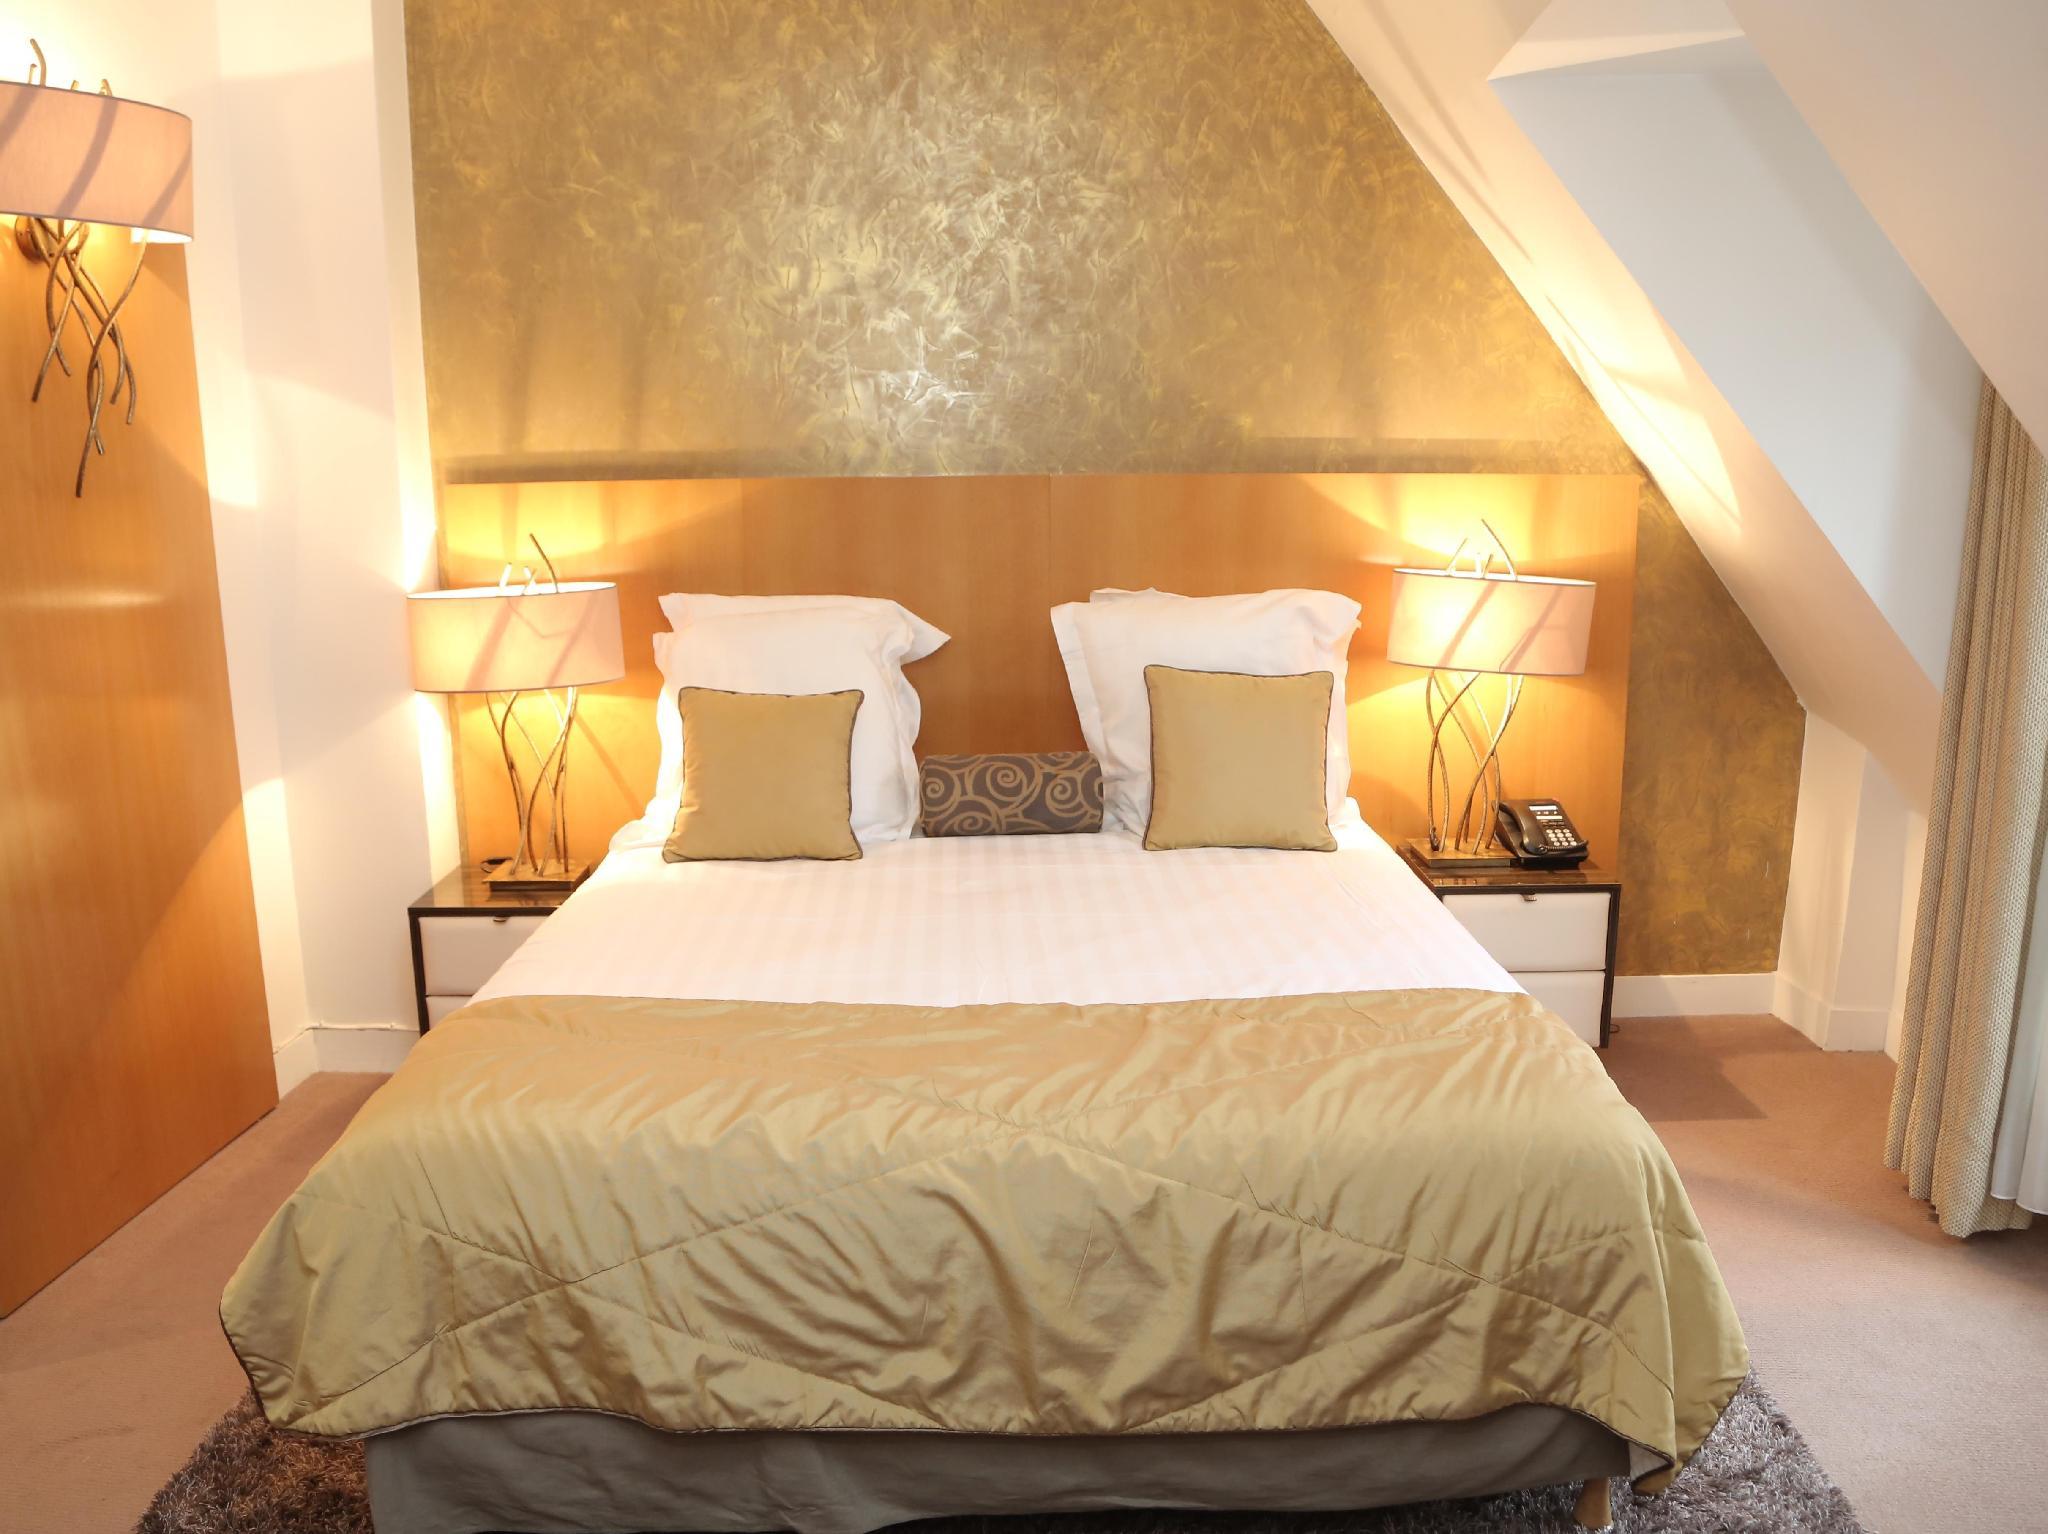 Boronali Hotel - Hotell och Boende i Frankrike i Europa